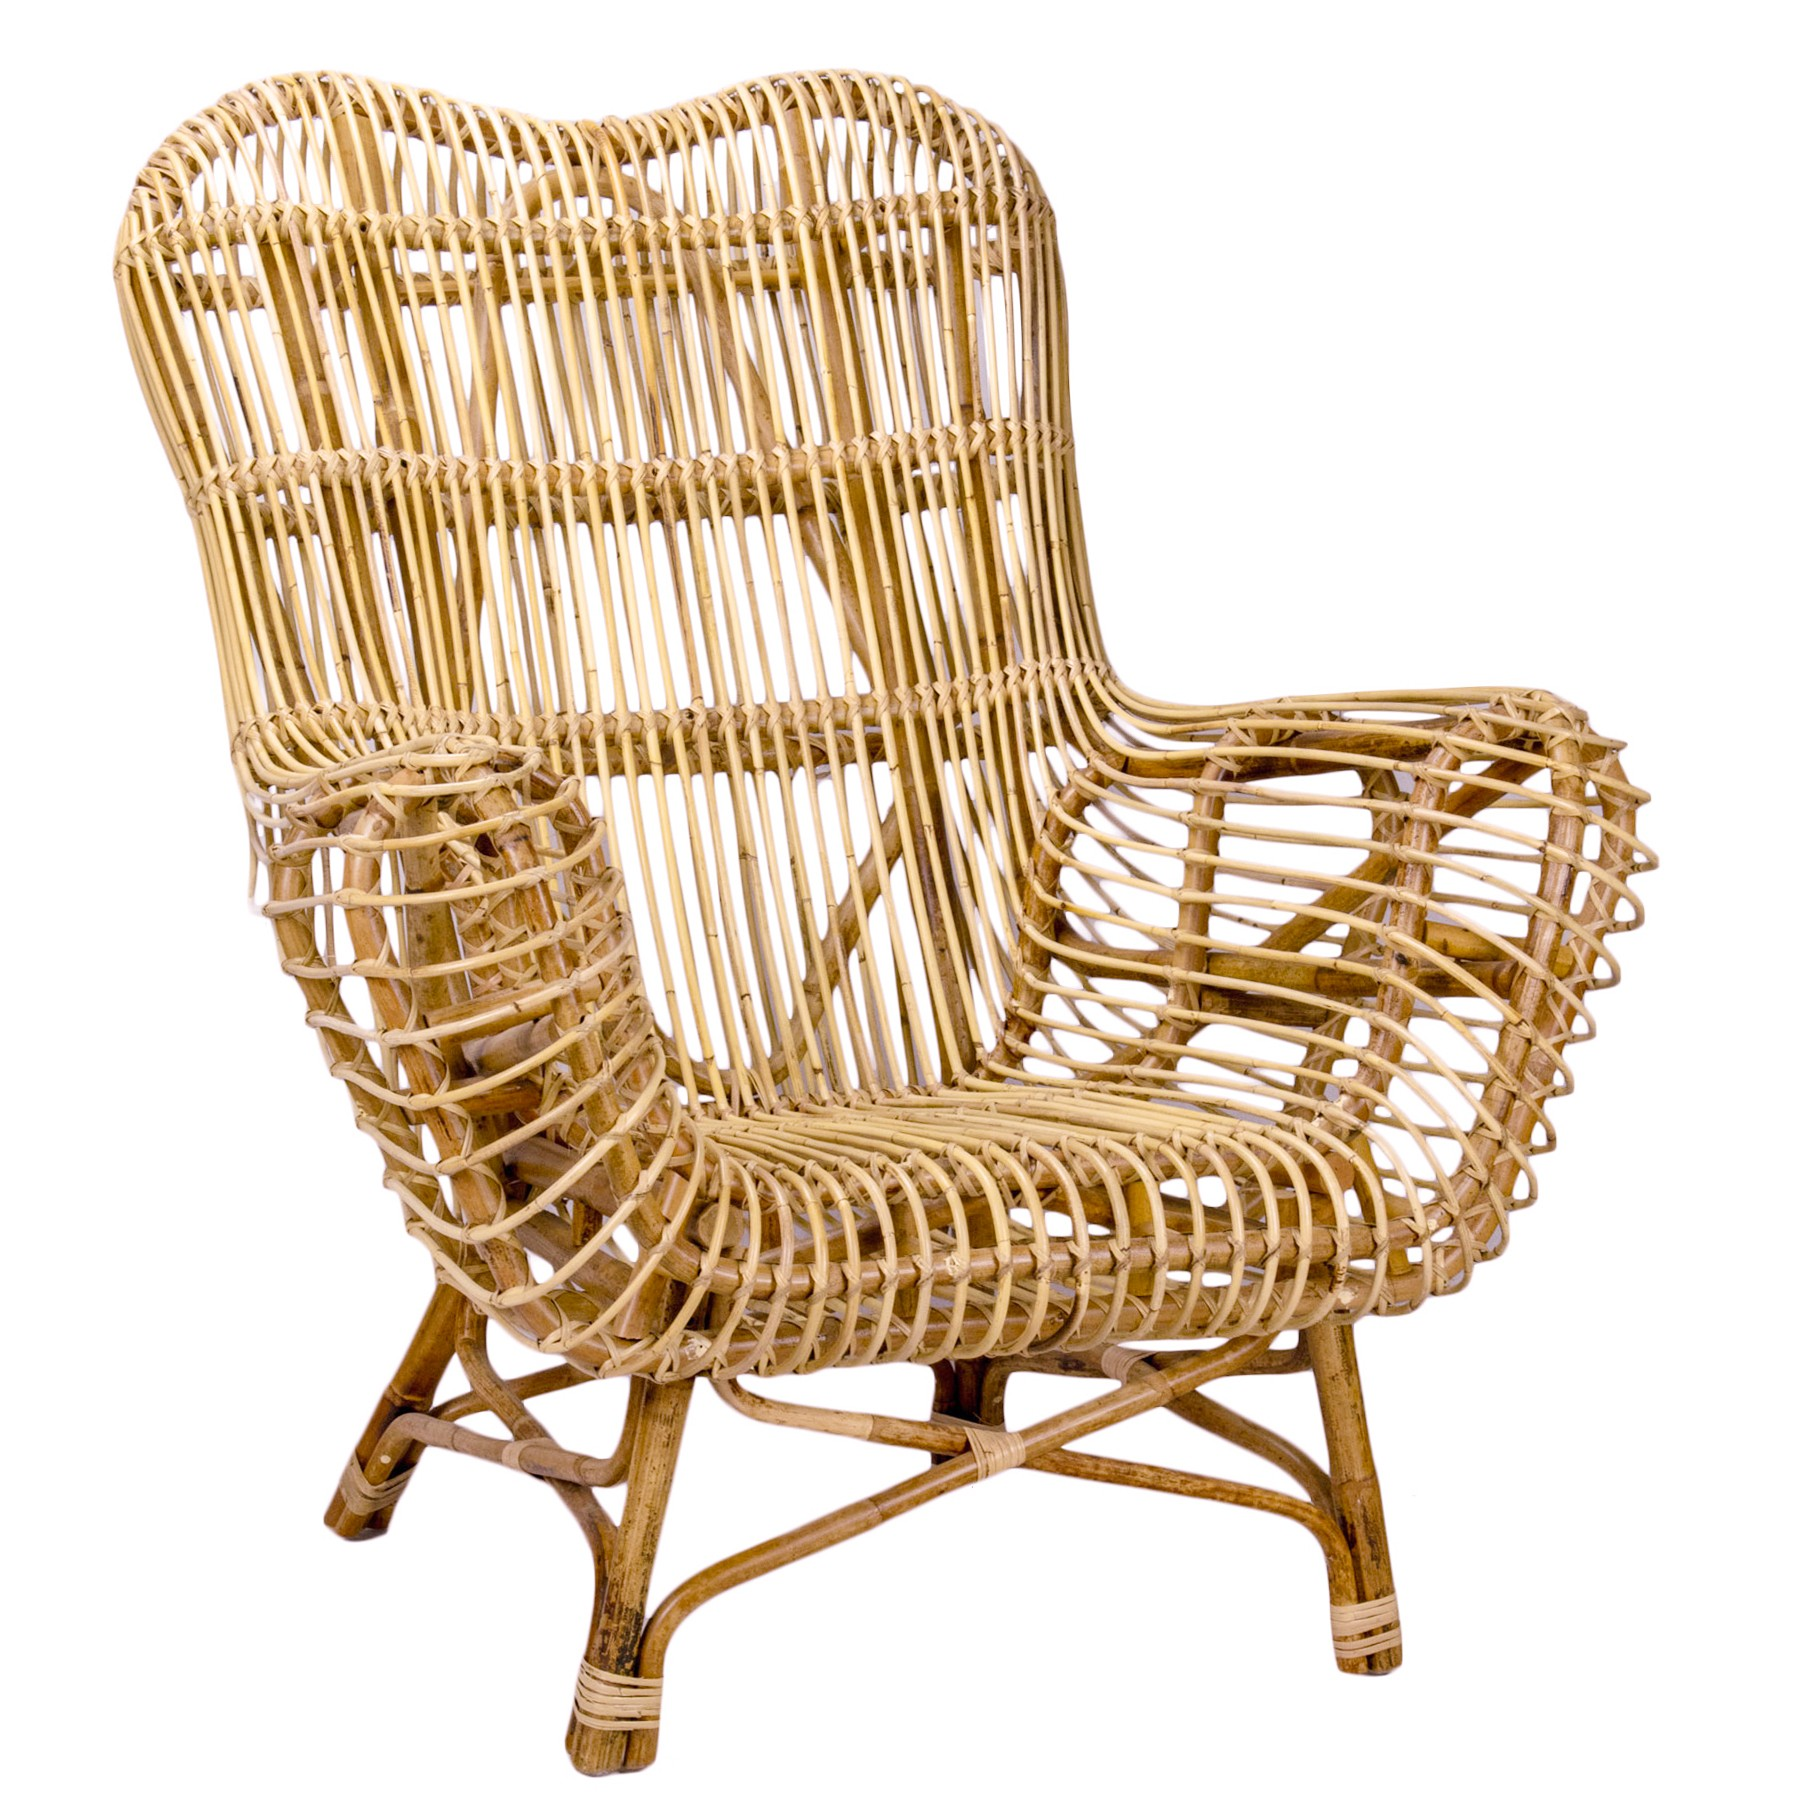 Kingstown Rattan Lounge Armchair